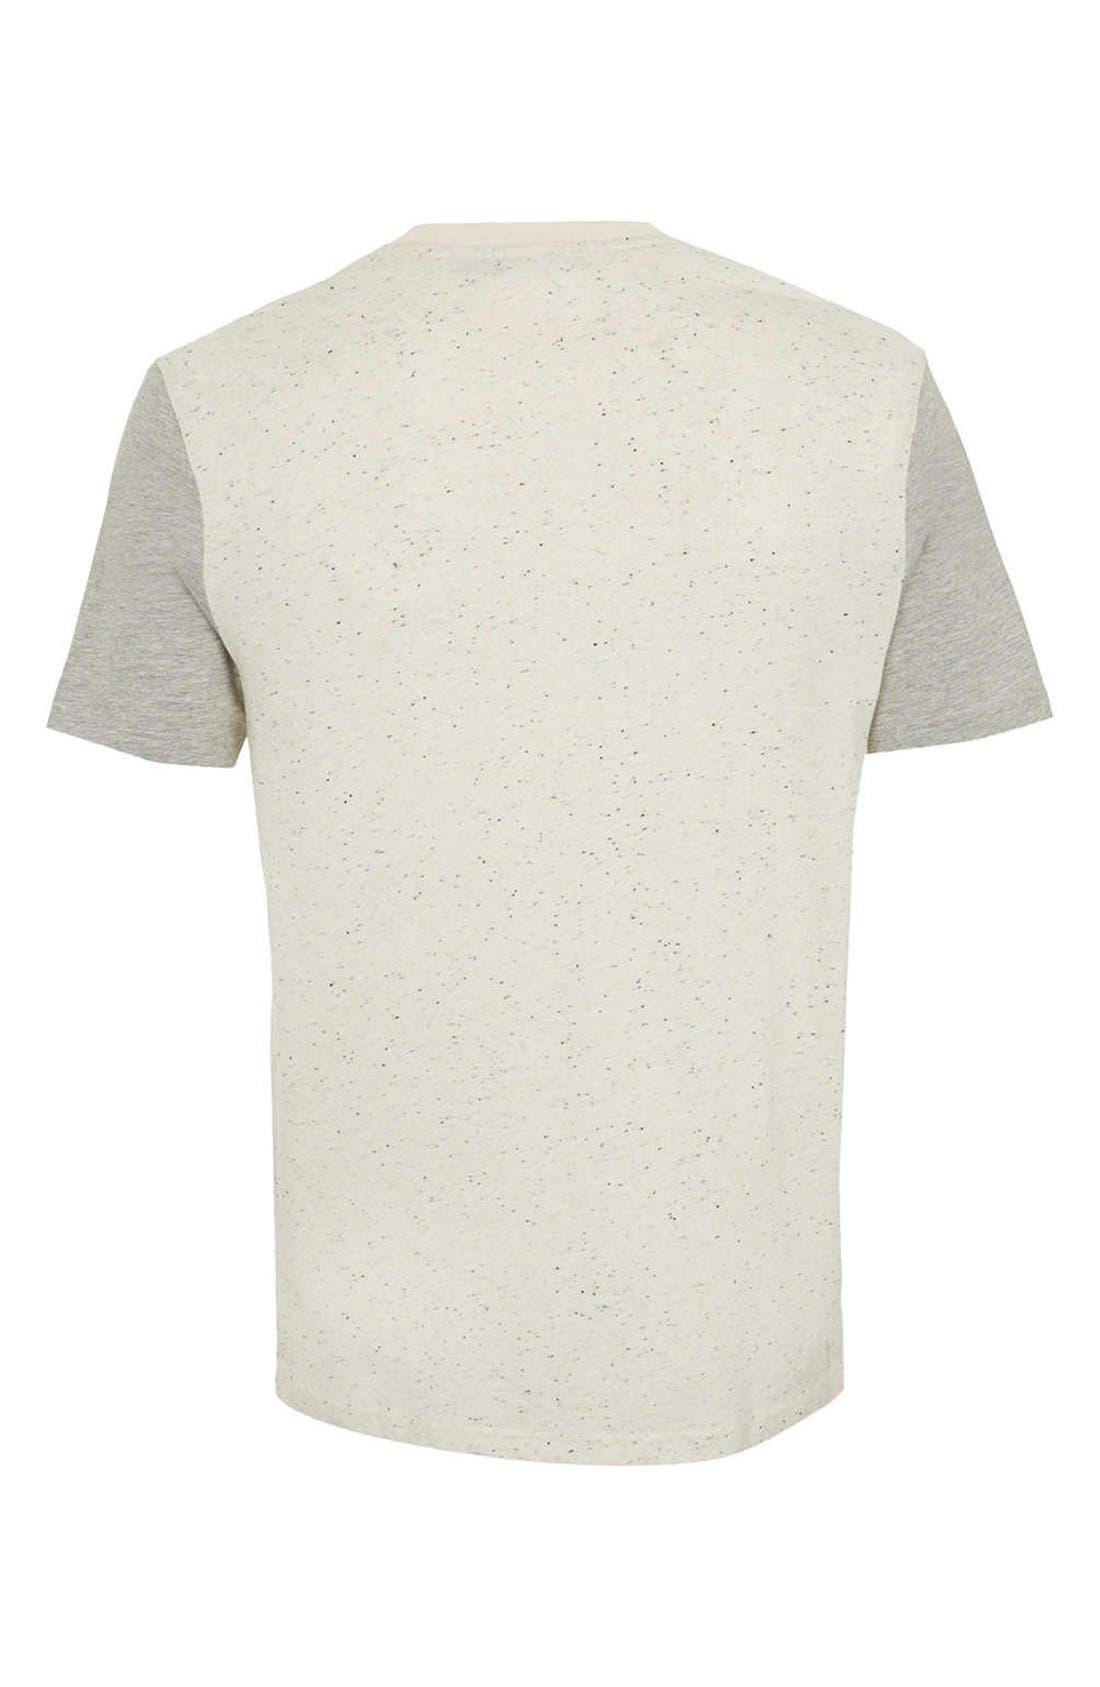 Alternate Image 2  - Topman Nep Contrast T-Shirt